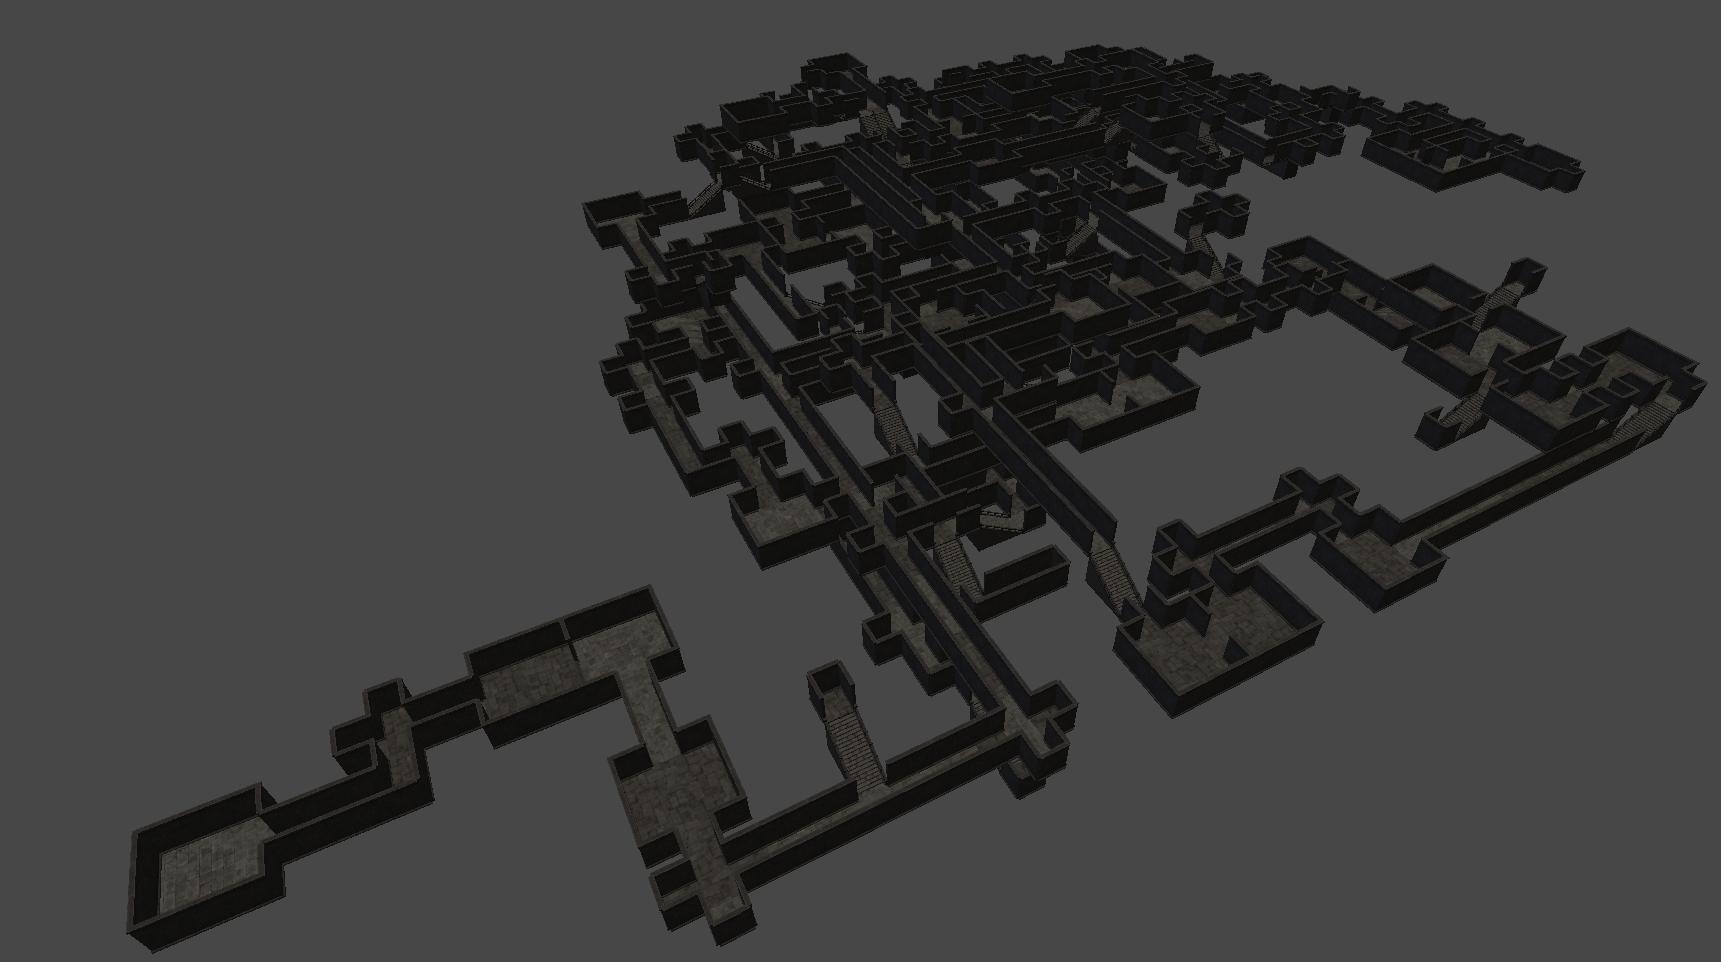 DunGen - large maze - 0001.PNG